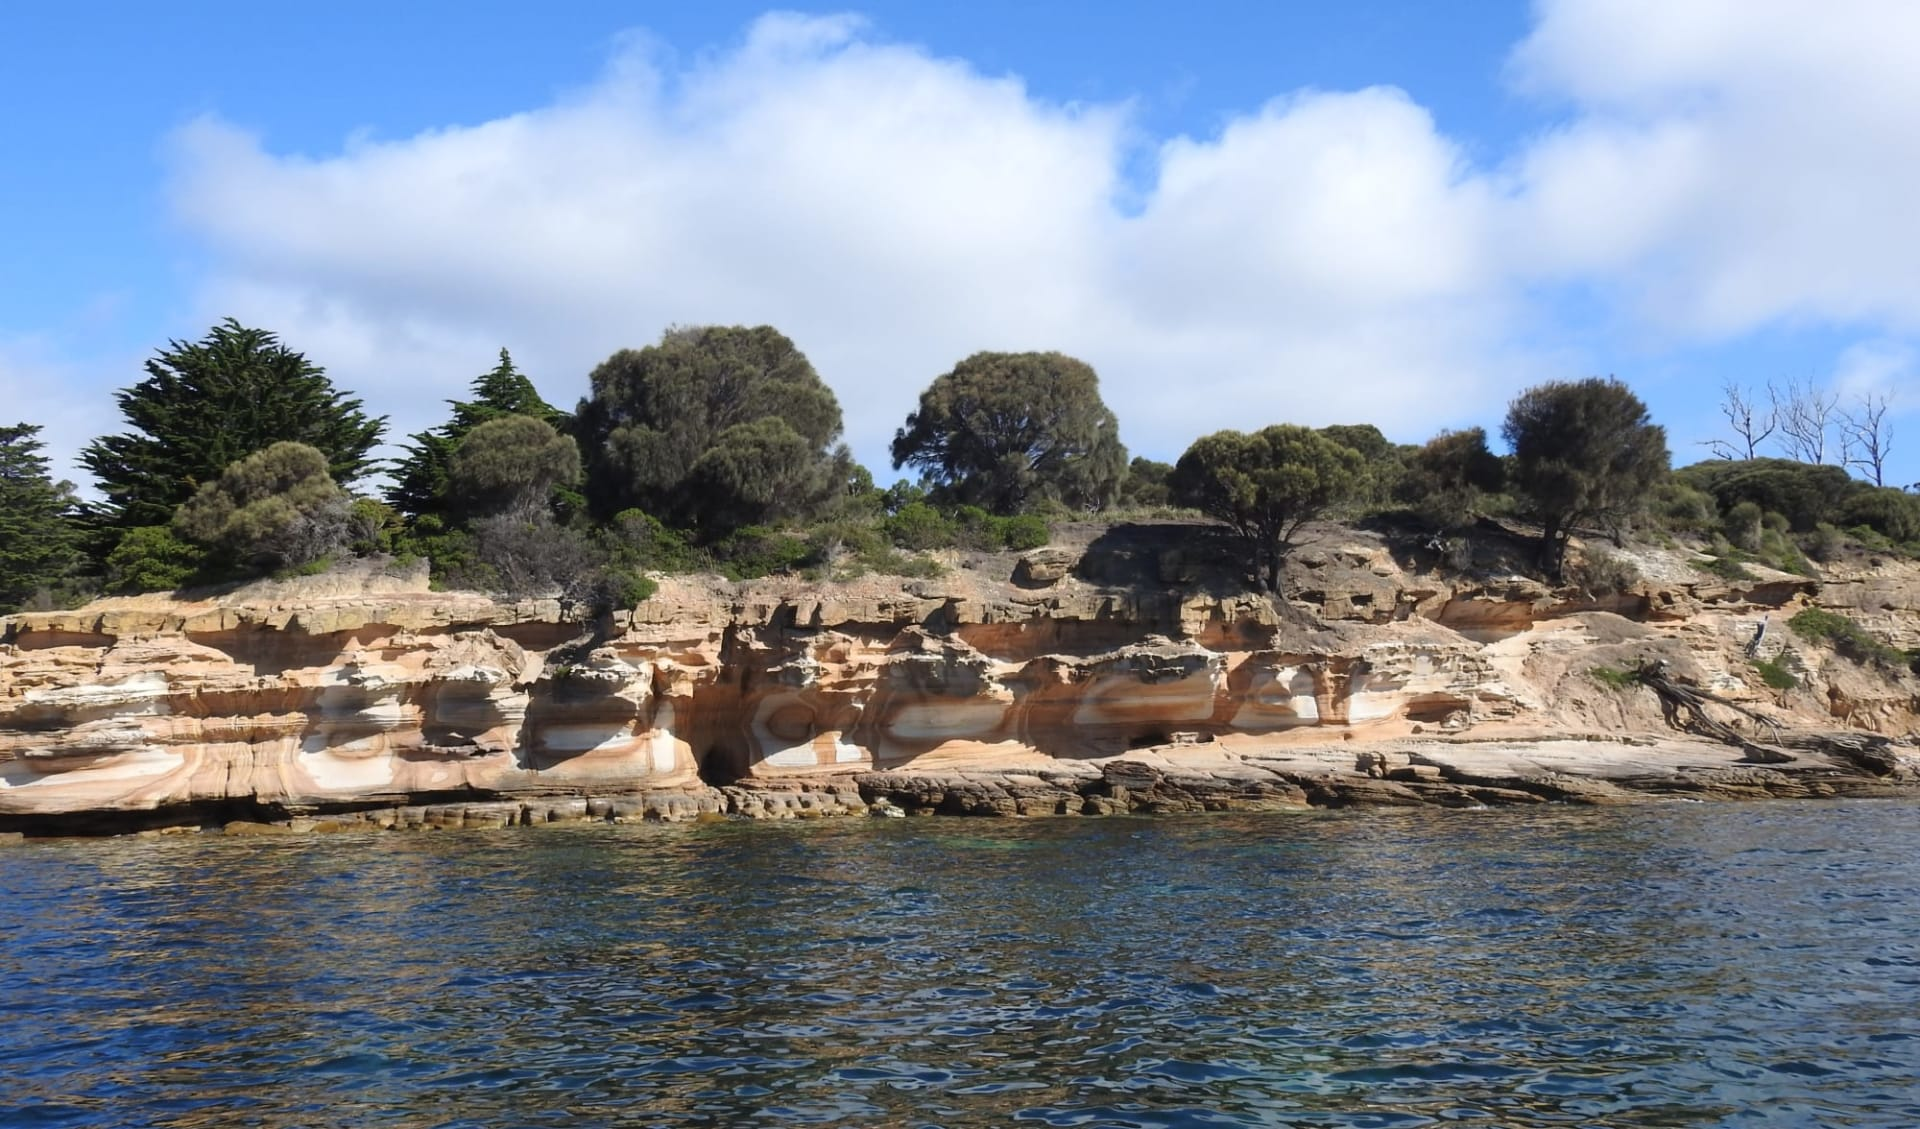 Coral Expeditions / Tasmanien ab Hobart: Australia - Tasmania - Maria Island - Coral Expeditions